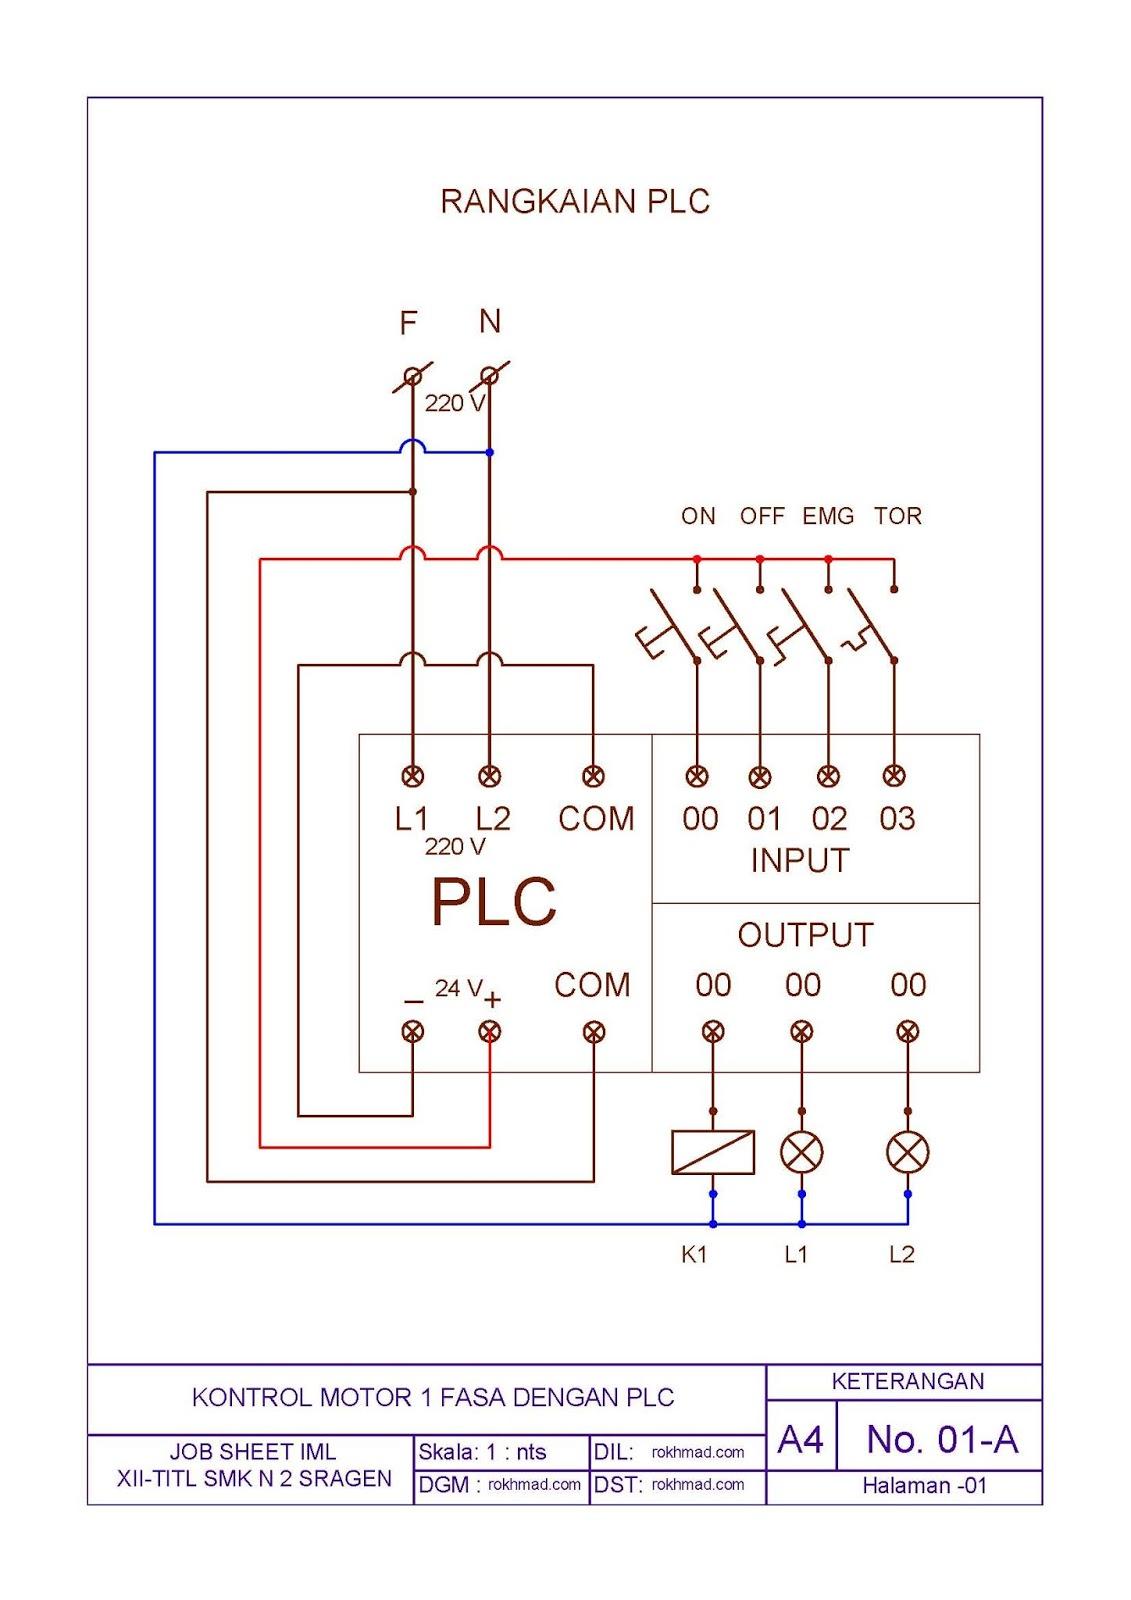 Job Sheet Praktek Plc 01 Menyalakan Satu Buah Motor Listrik 3 Fasa